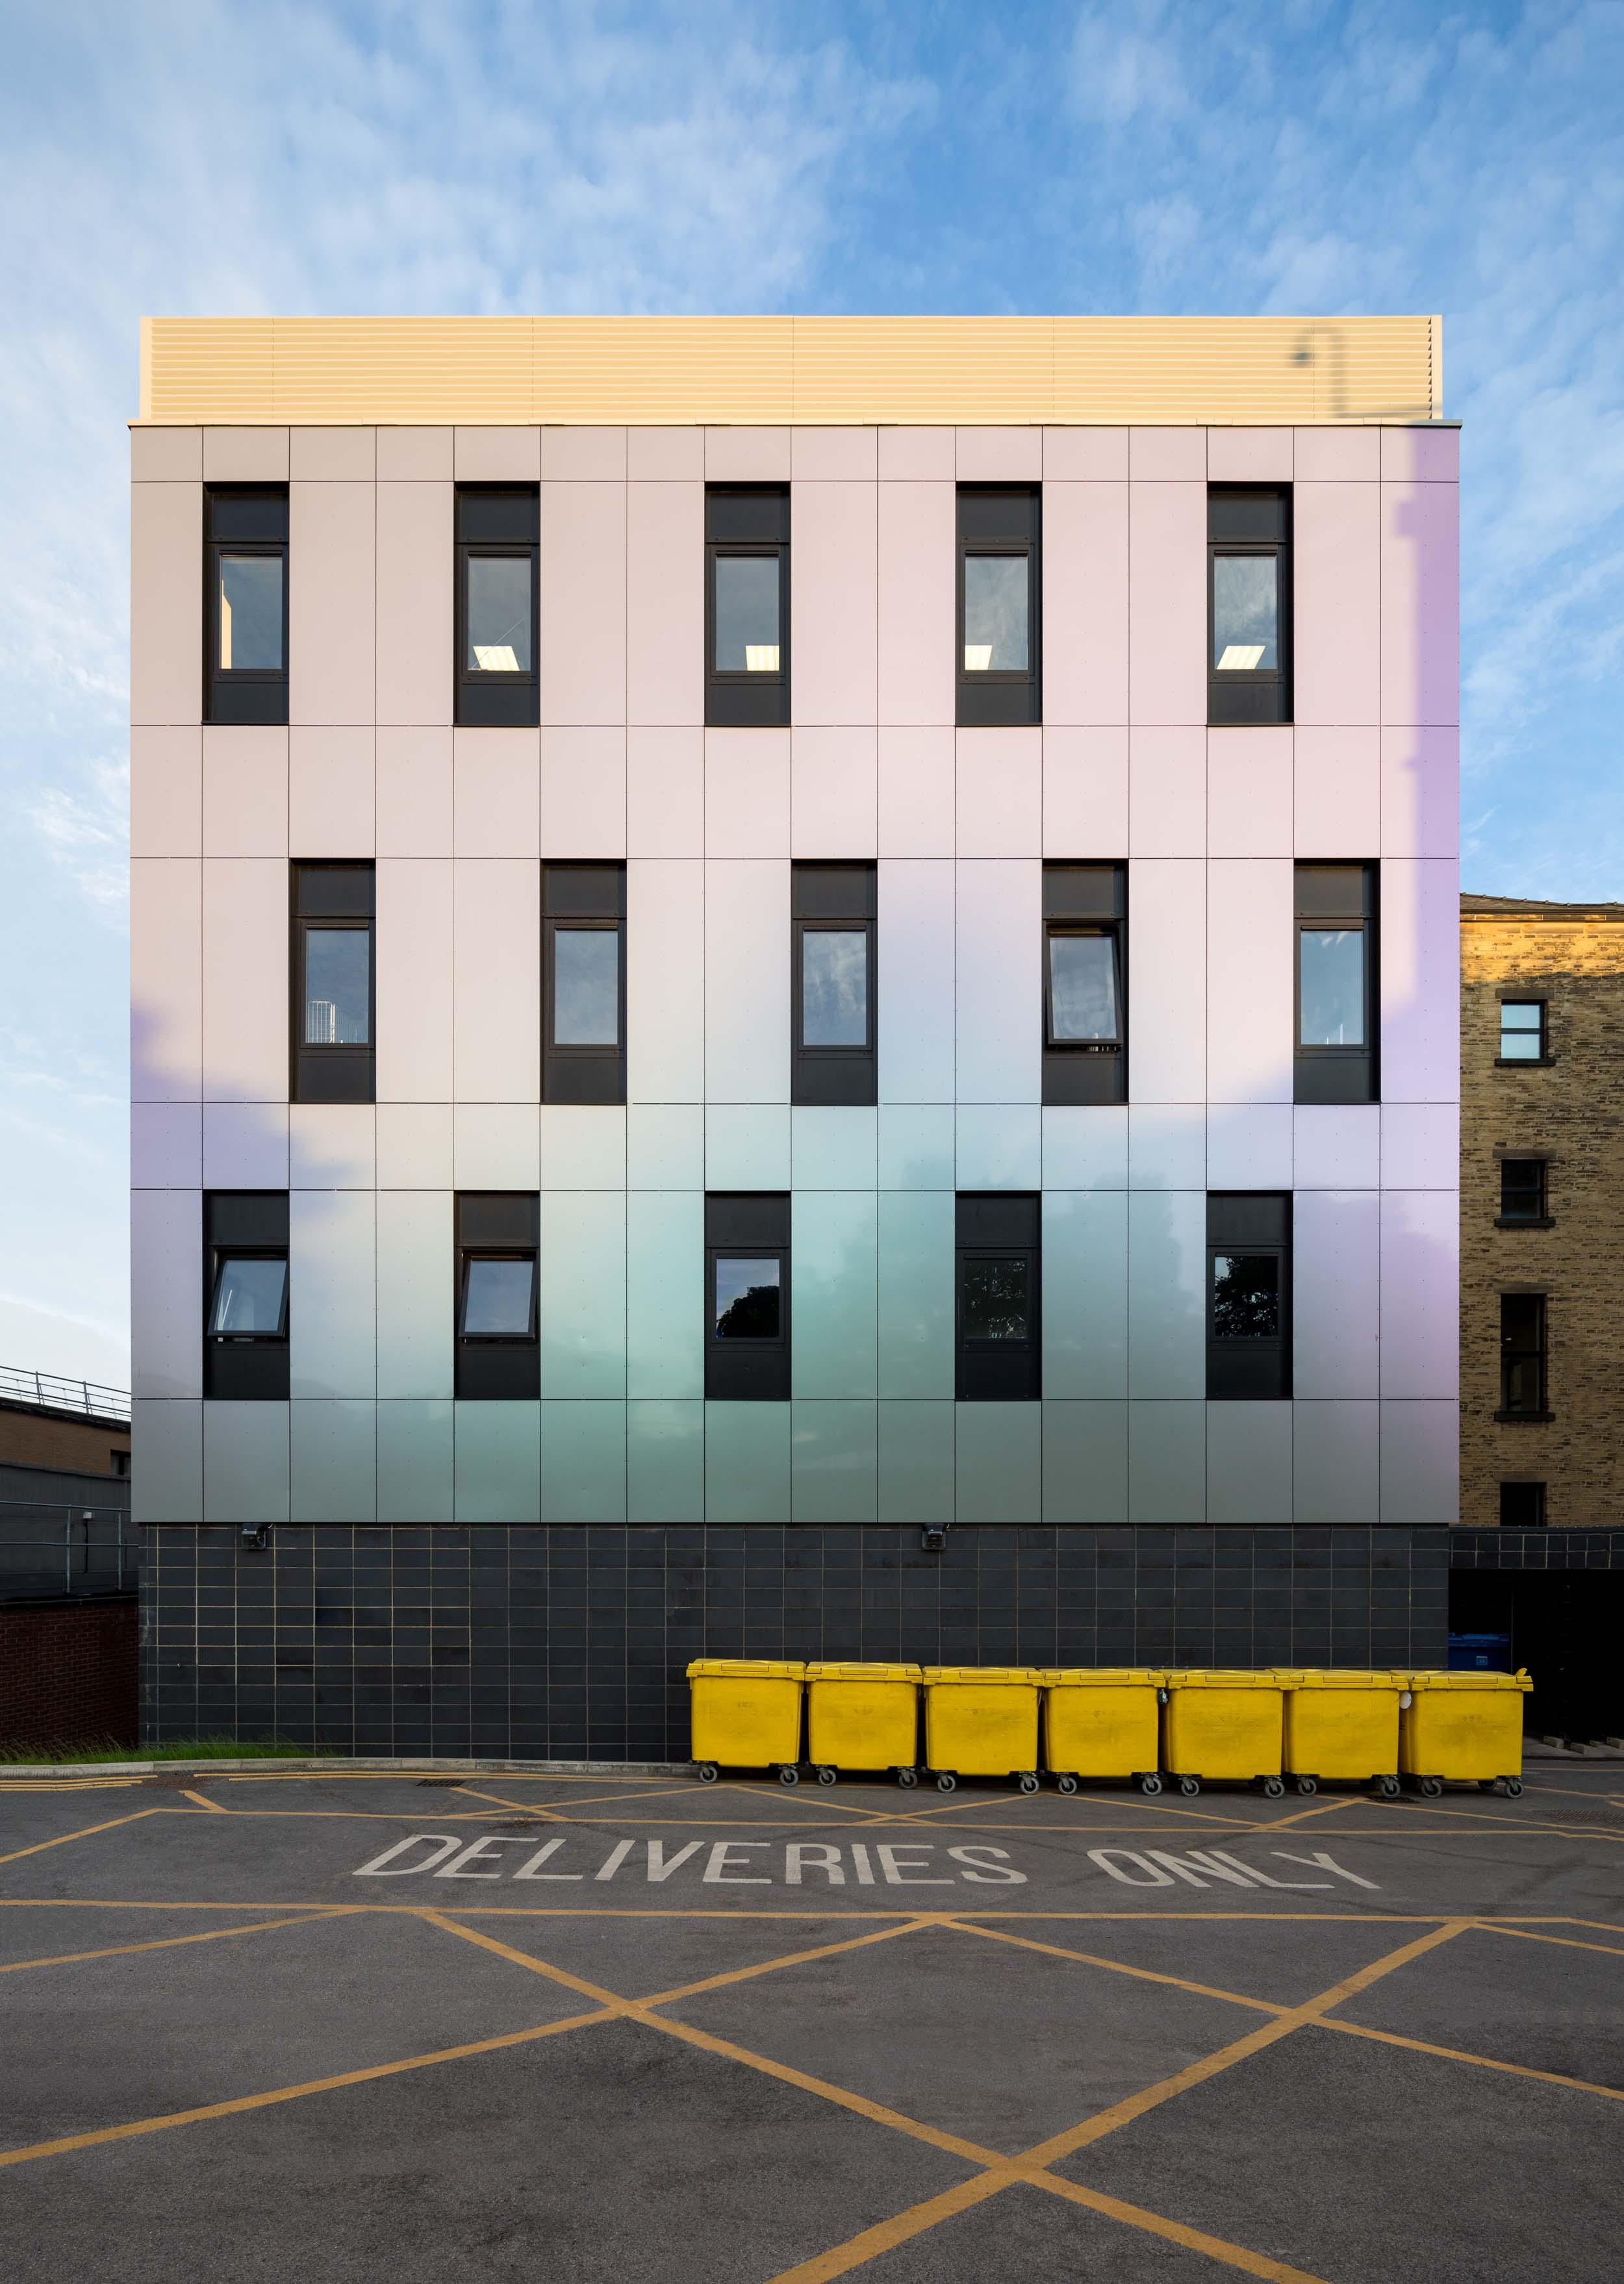 bradford royal infirmary endoscopy unit exterior.jpg